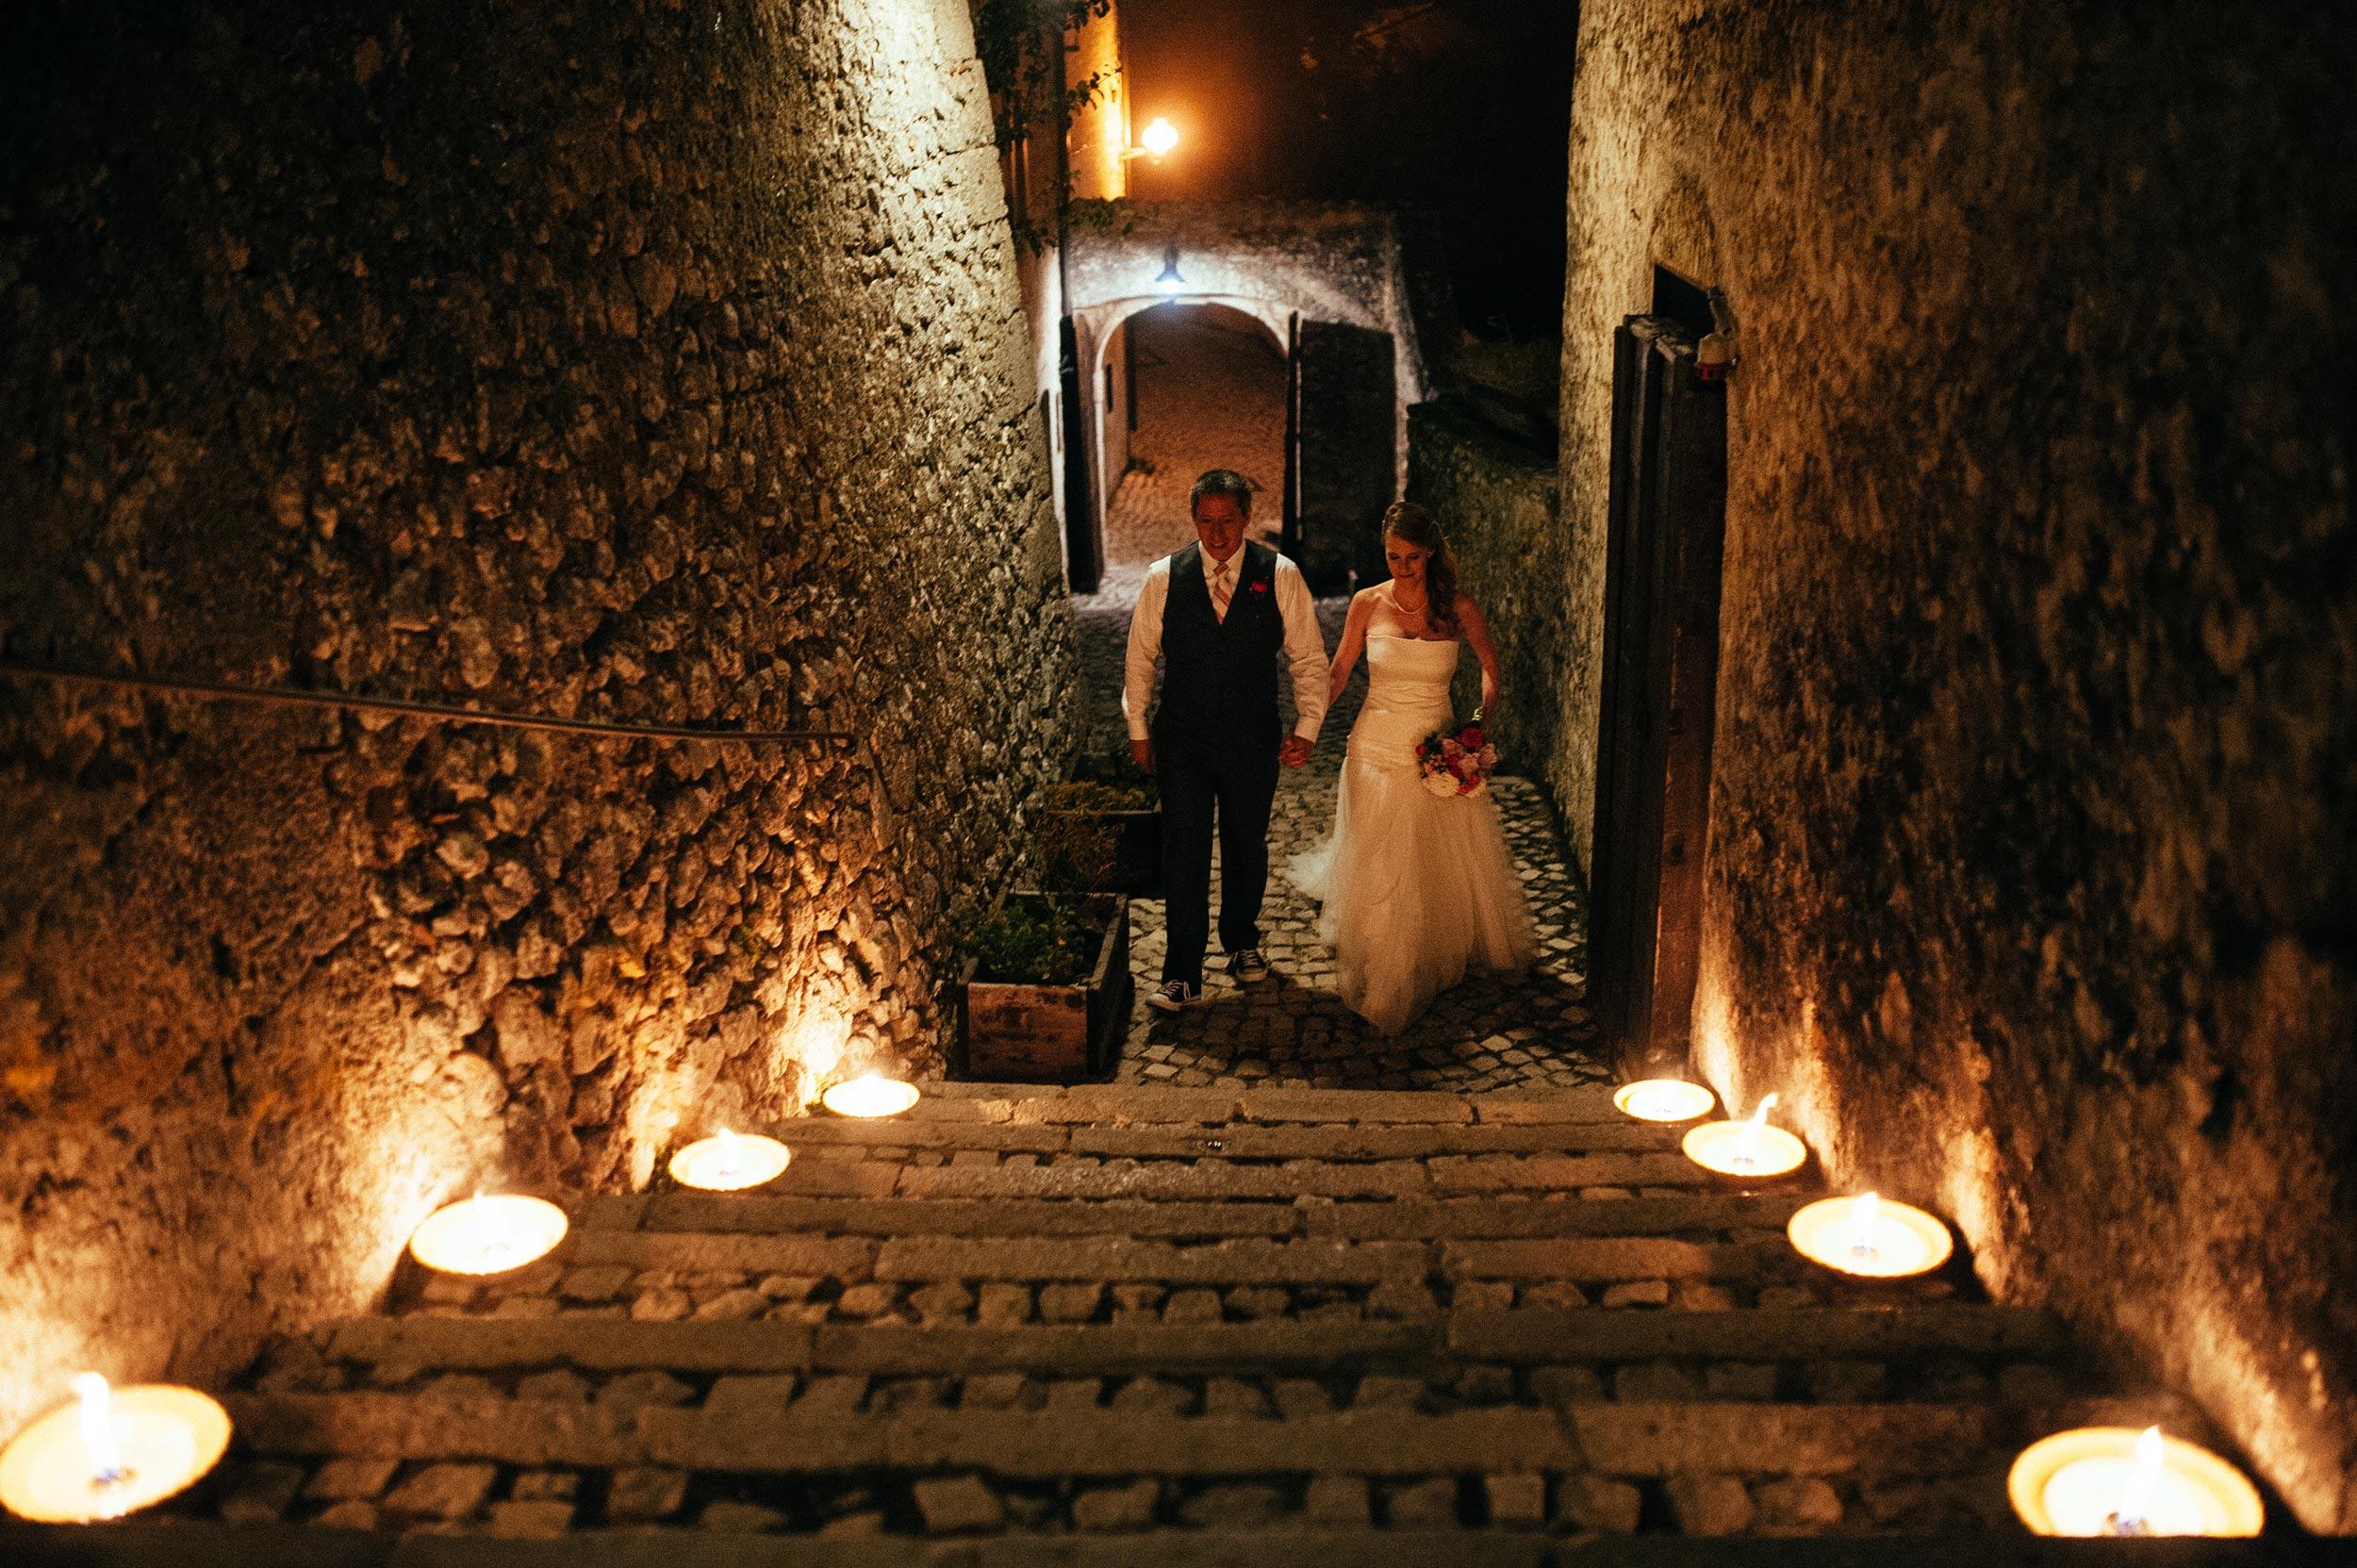 2014-Shelby-Jocelyn-Santo-Stefano-Di-Sessanio-Wedding-Photographer-Italy-Alessandro-Avenali-37.jpg